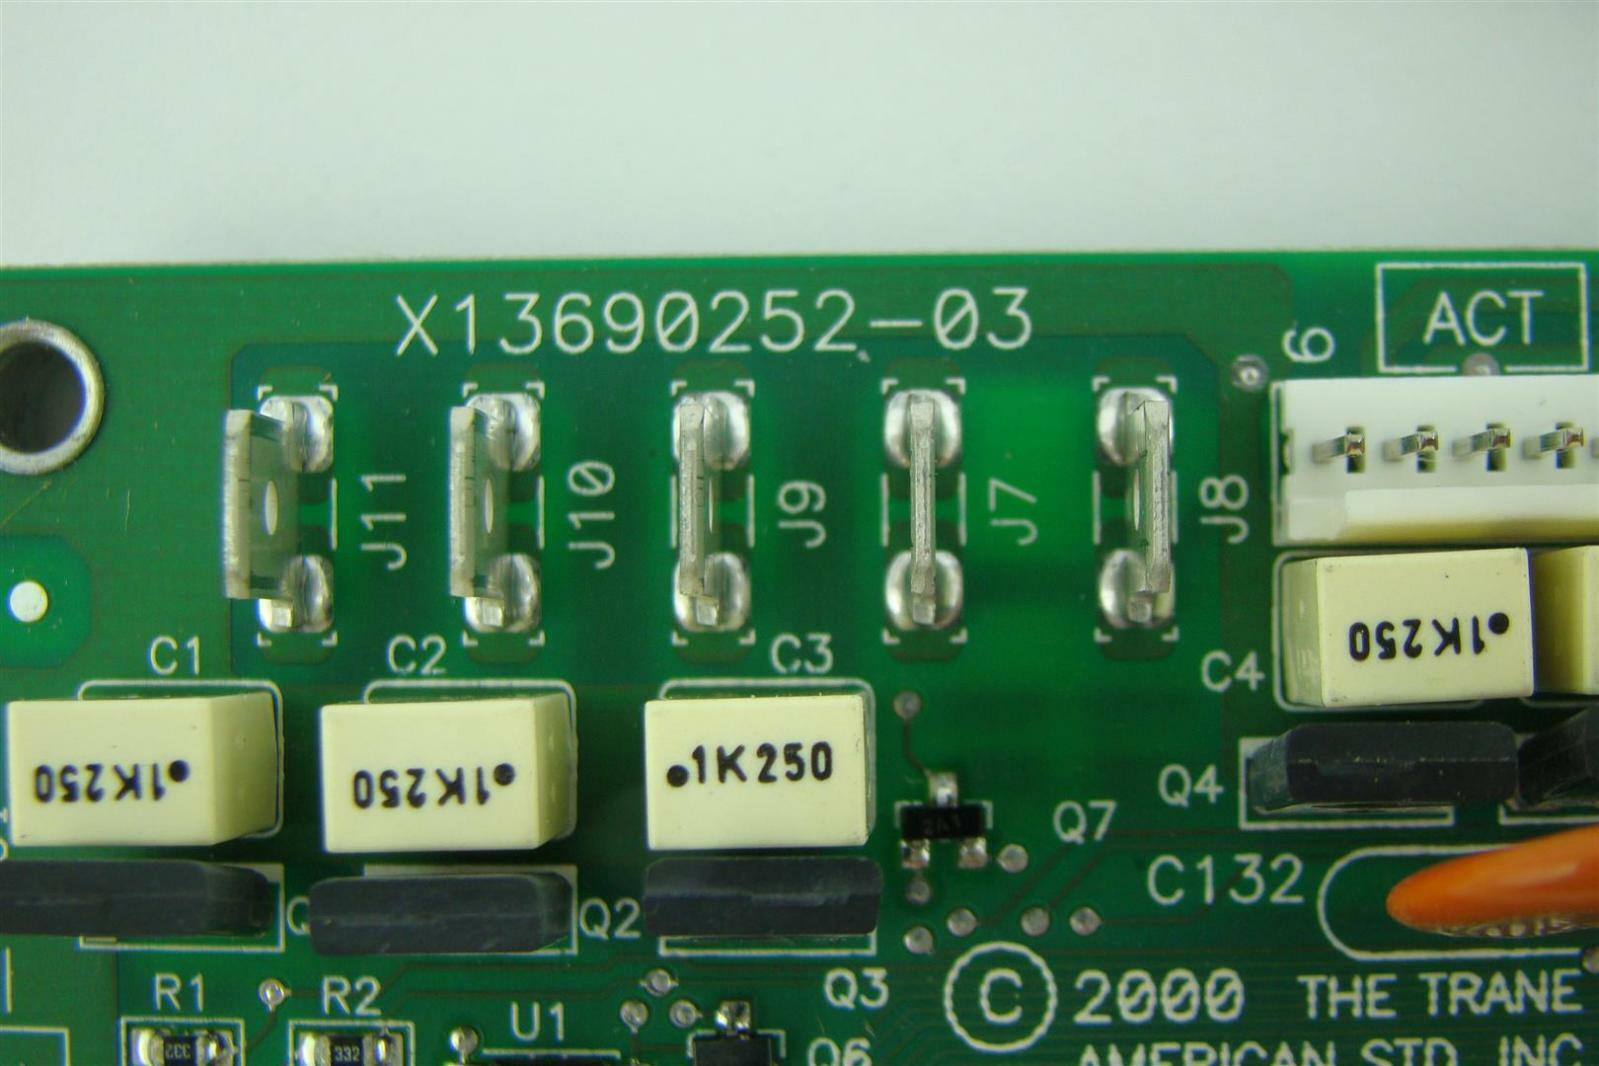 Trane Circuit Board Printed Brd02806 Ebay